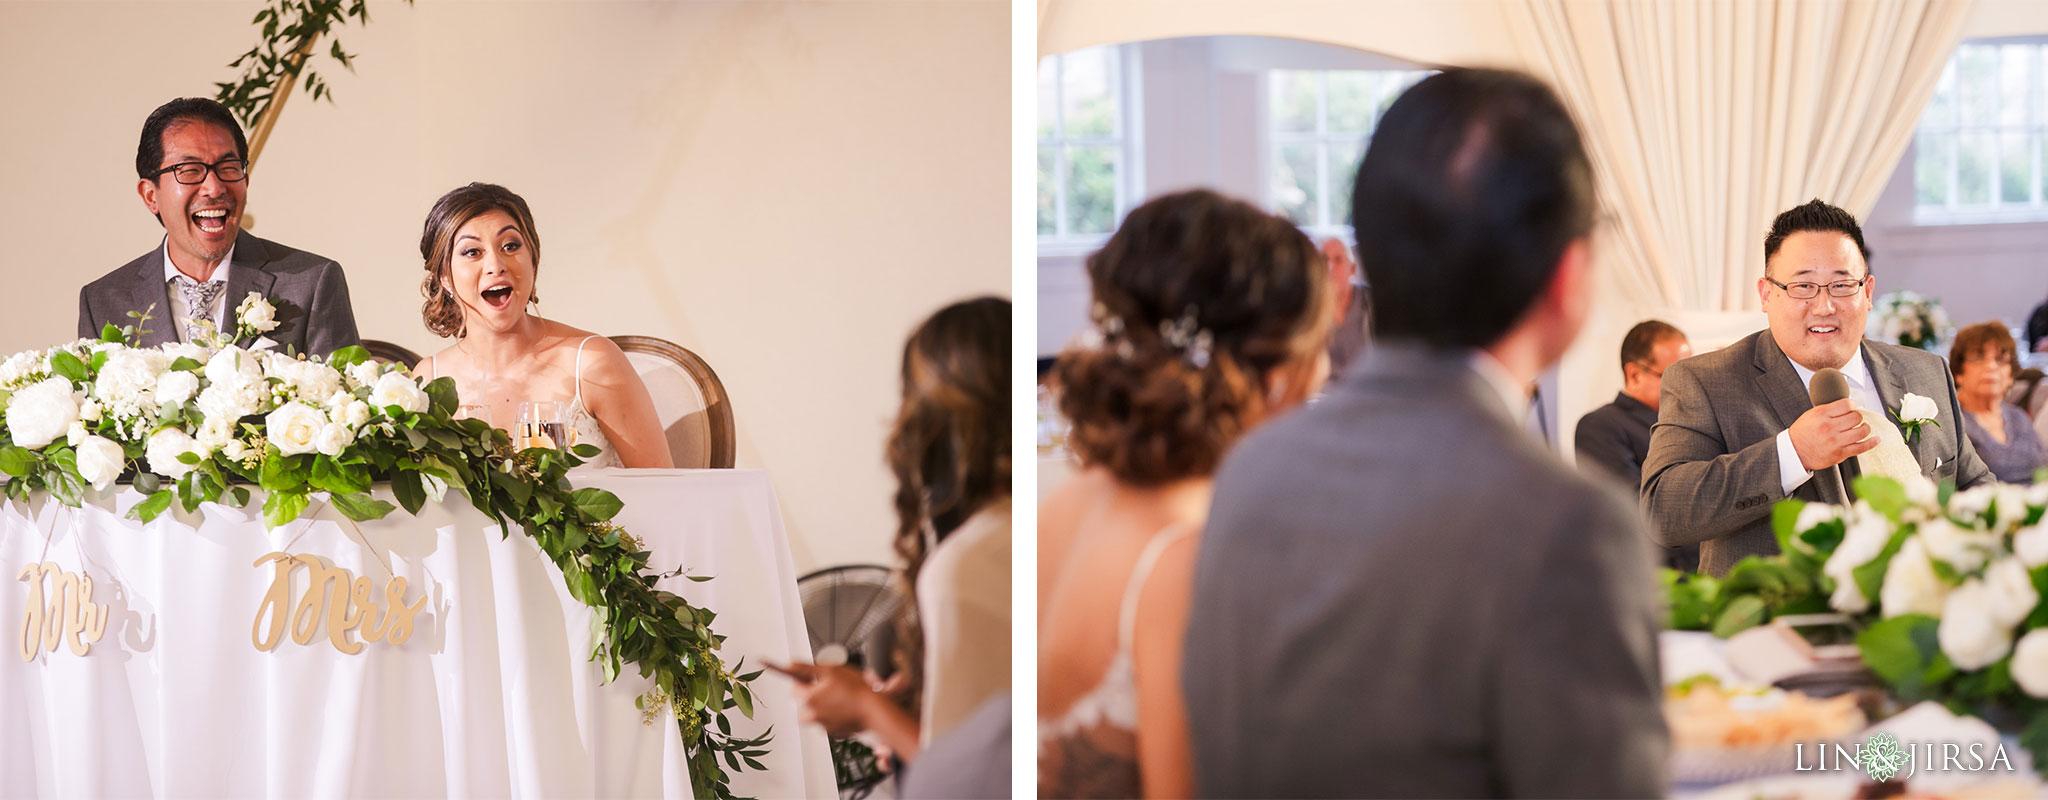 033 york manor los angeles wedding reception photography